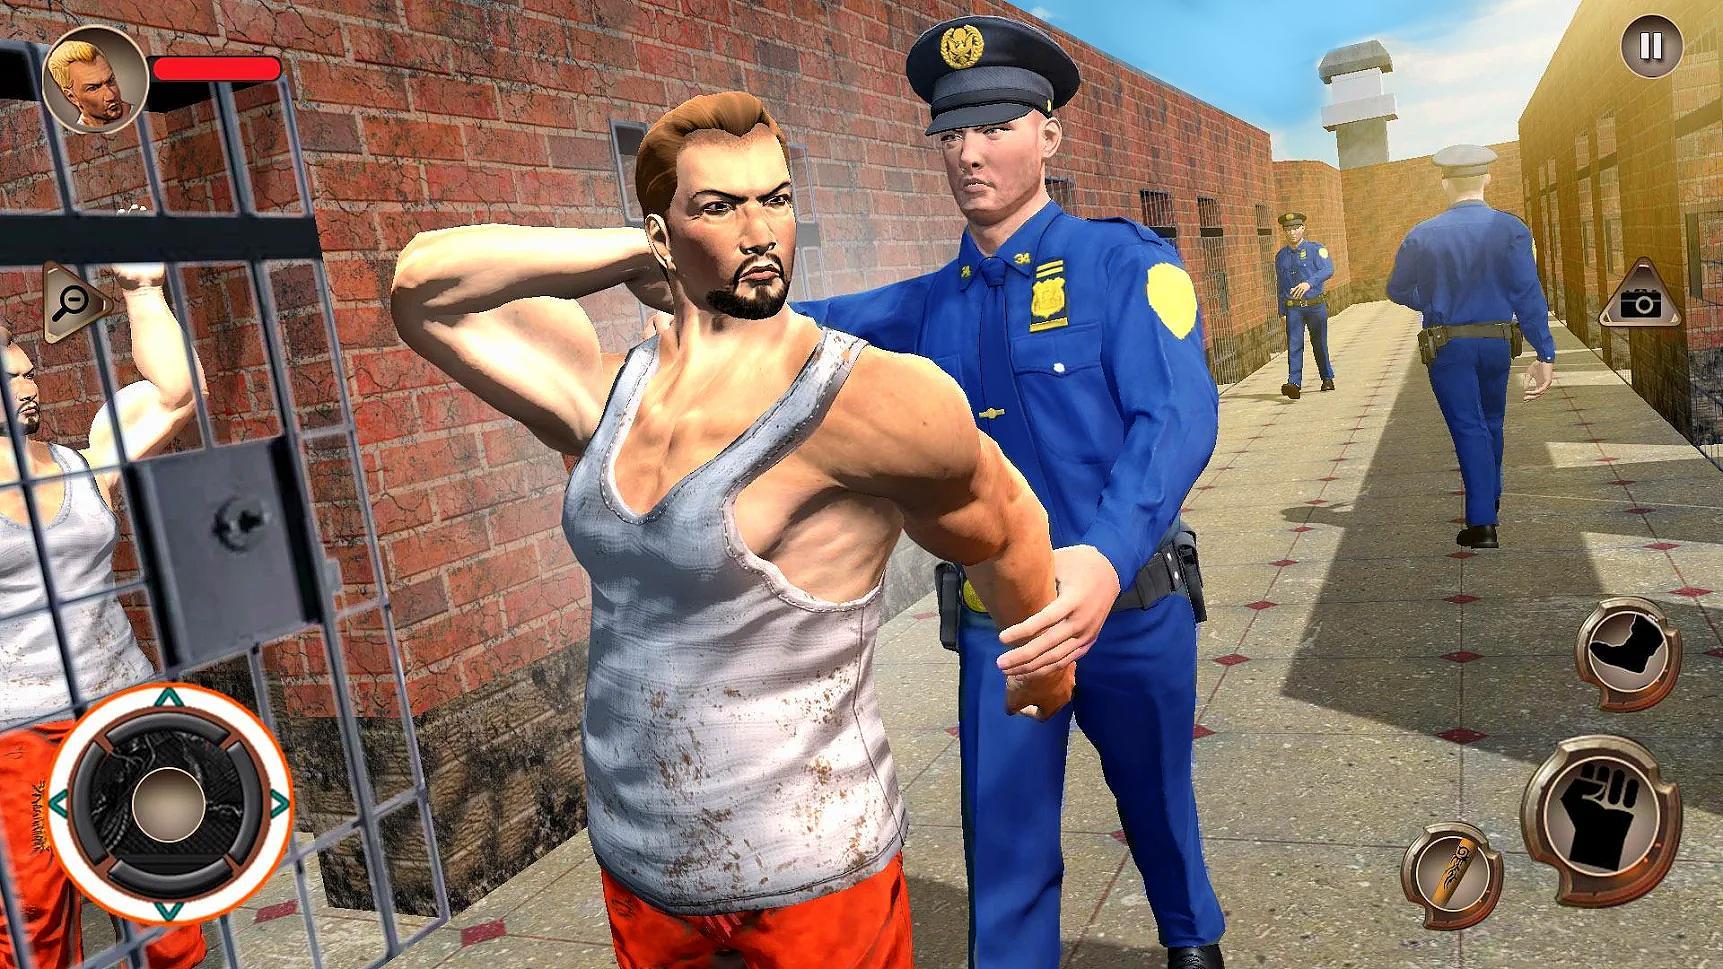 US Police Grand Jail break Prison Escape Games 1.9 Screenshot 15